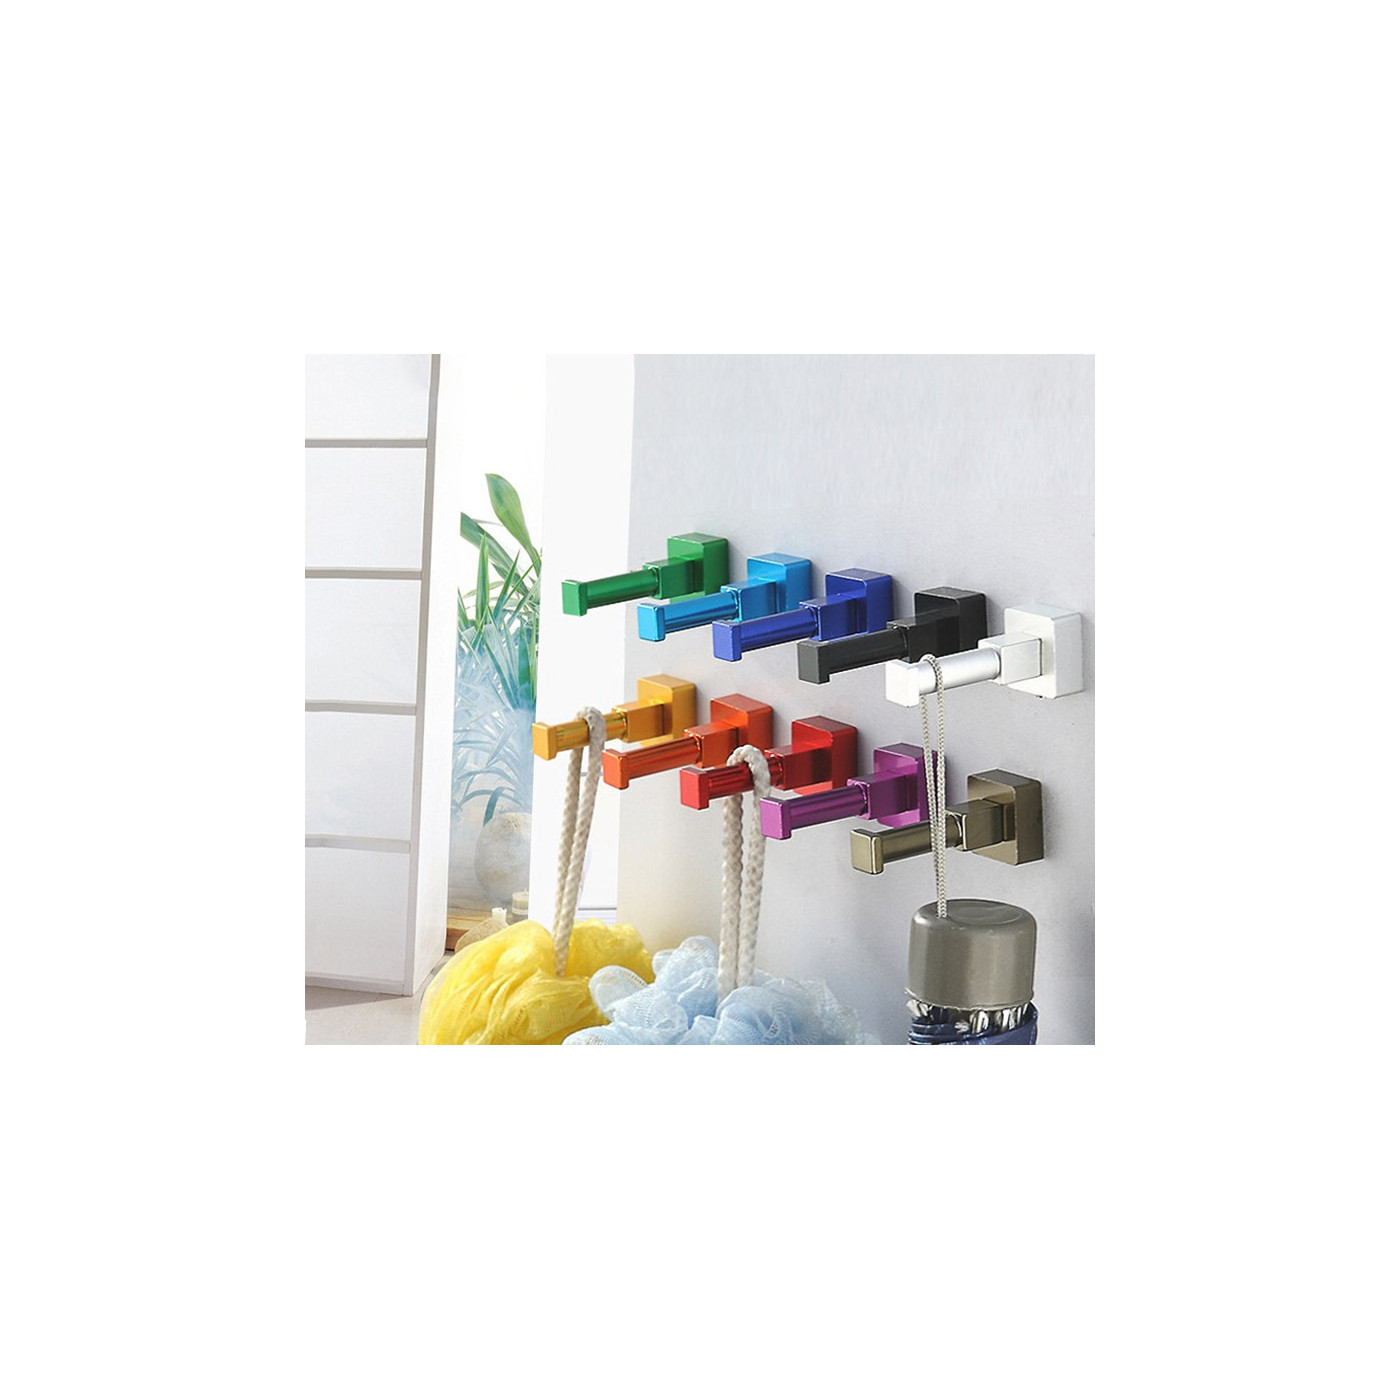 Set of 10 colorful clothes hooks (aluminum, square, black)